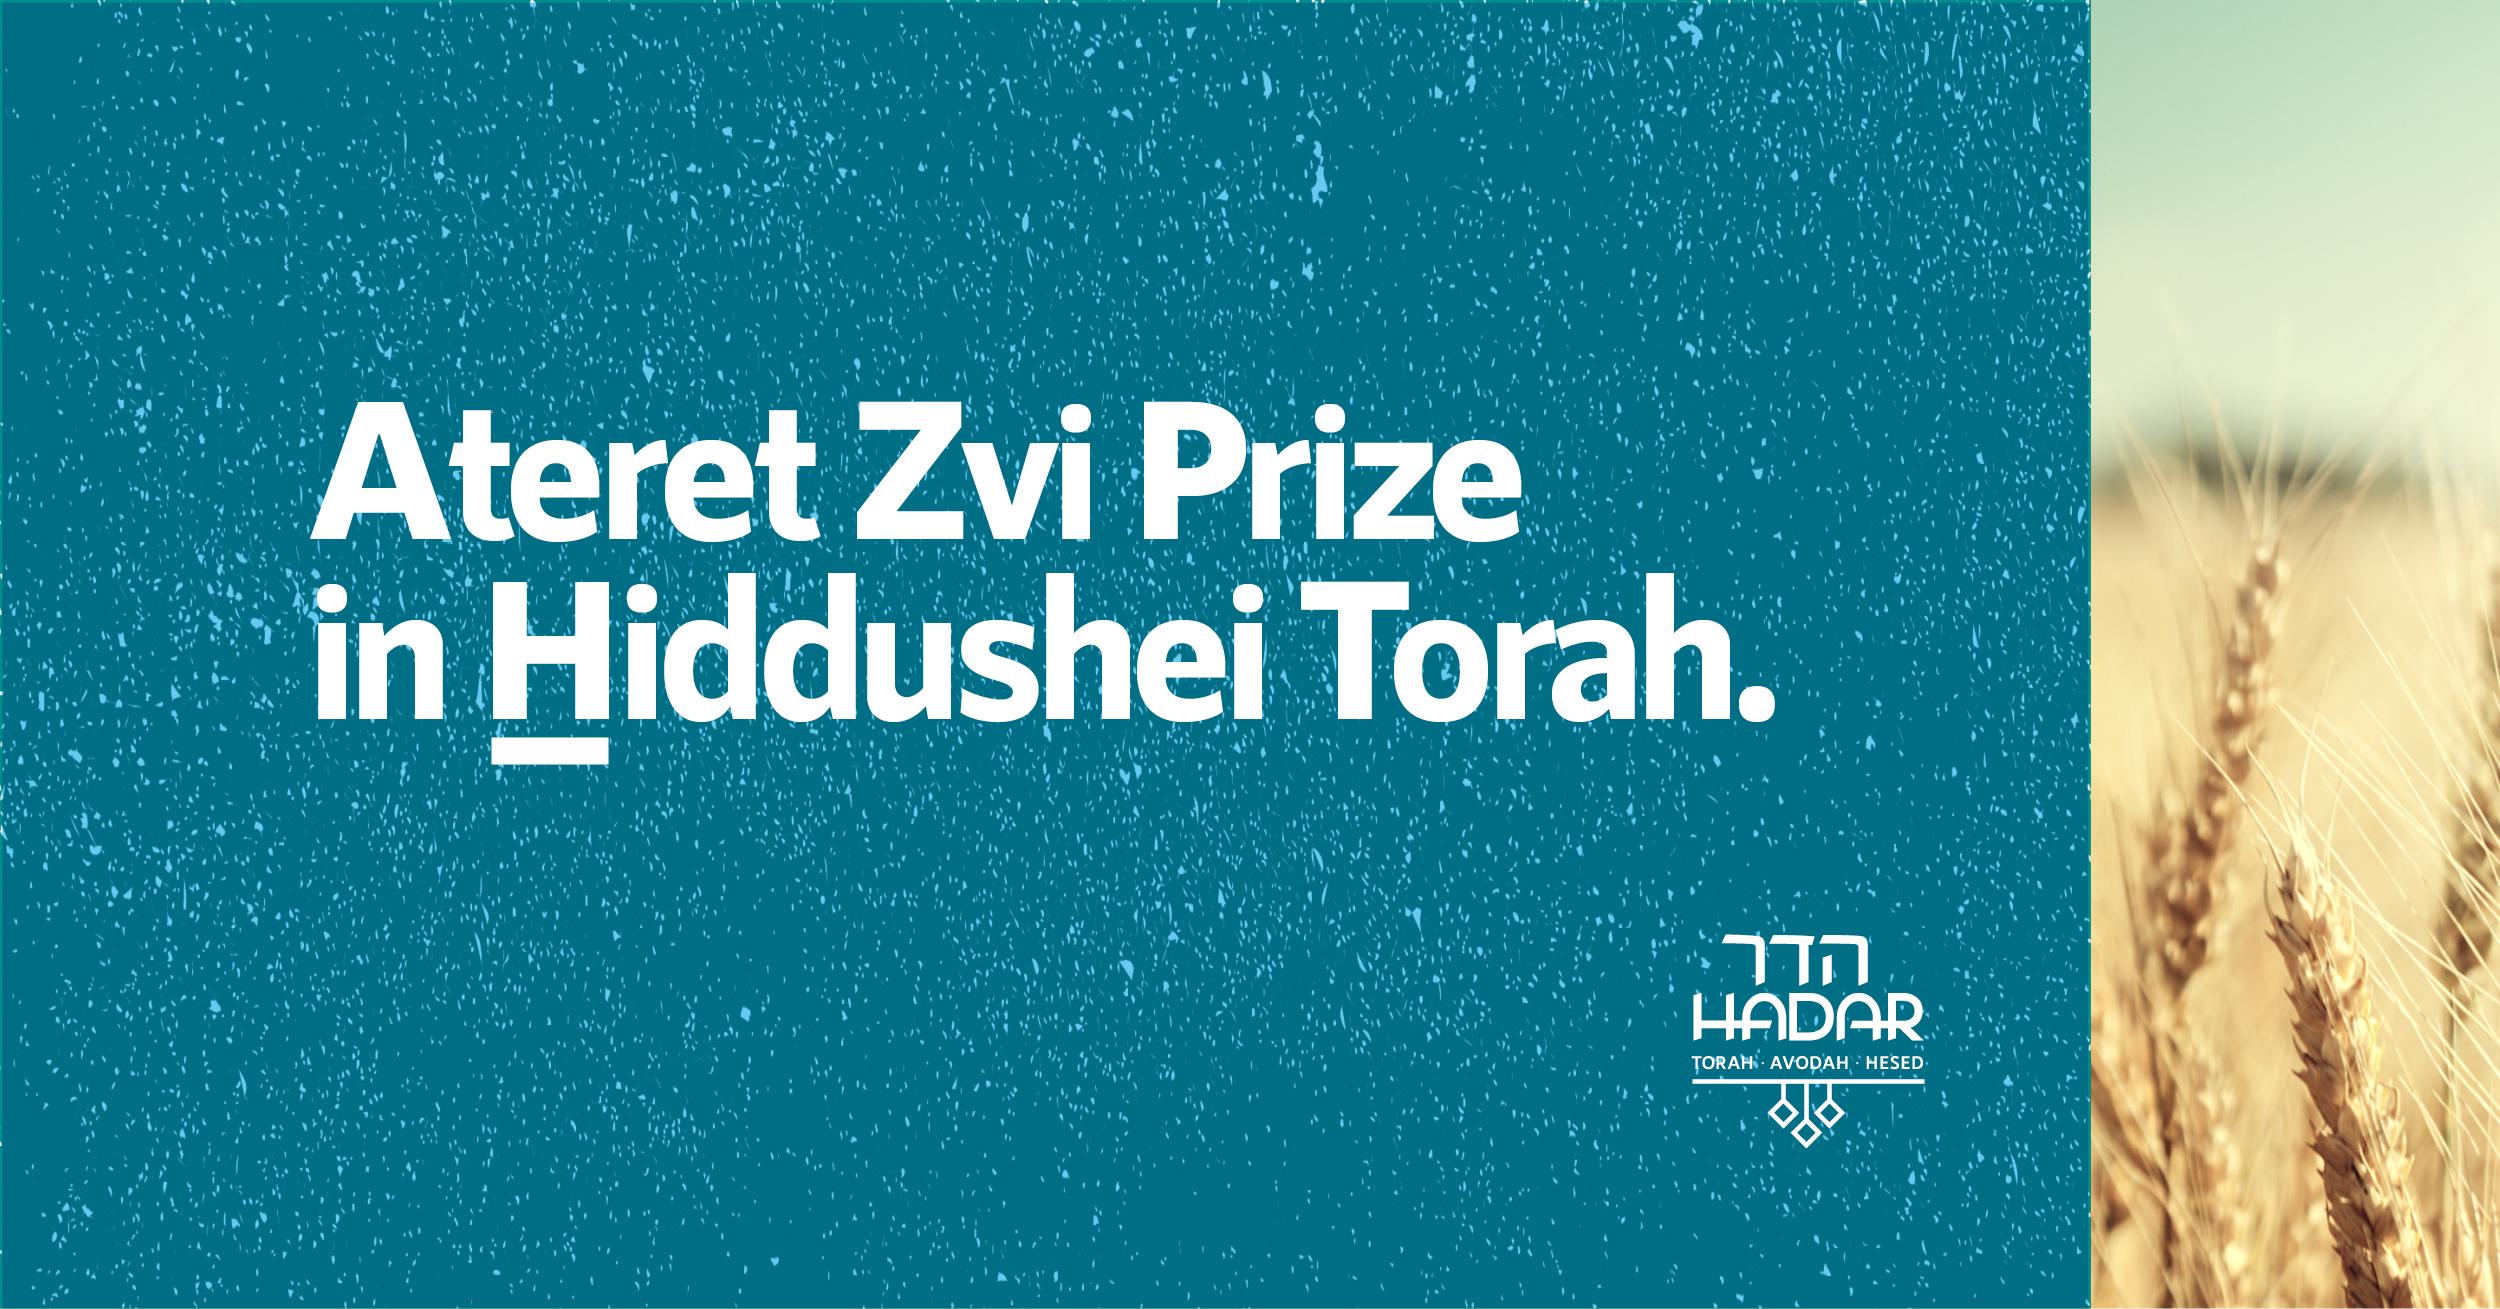 Ateret Zvi Prize in Hiddushei Torah